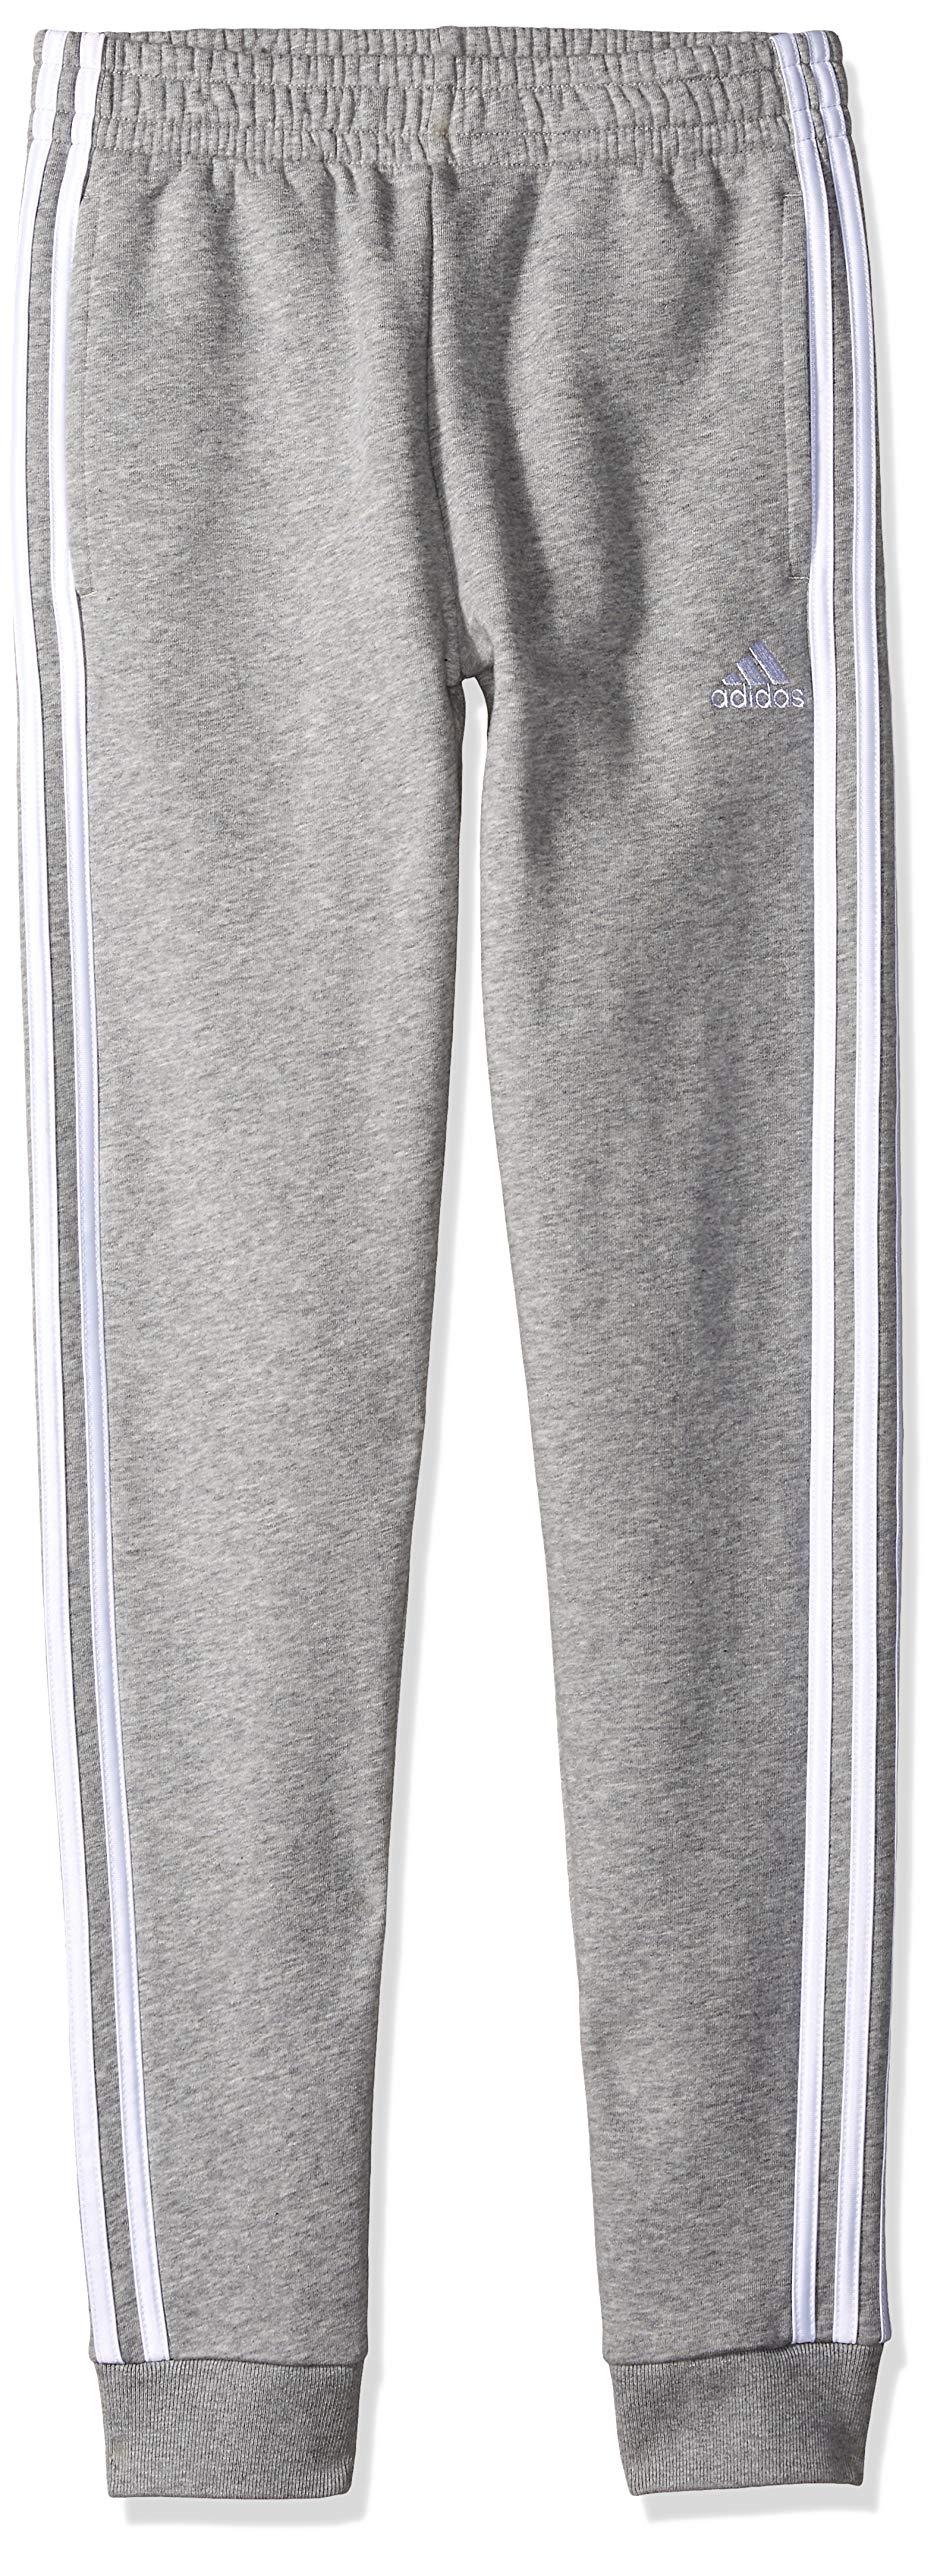 adidas Boys' Big Fleece Jogger Pant, Focus Medium Grey Heather, S (8)